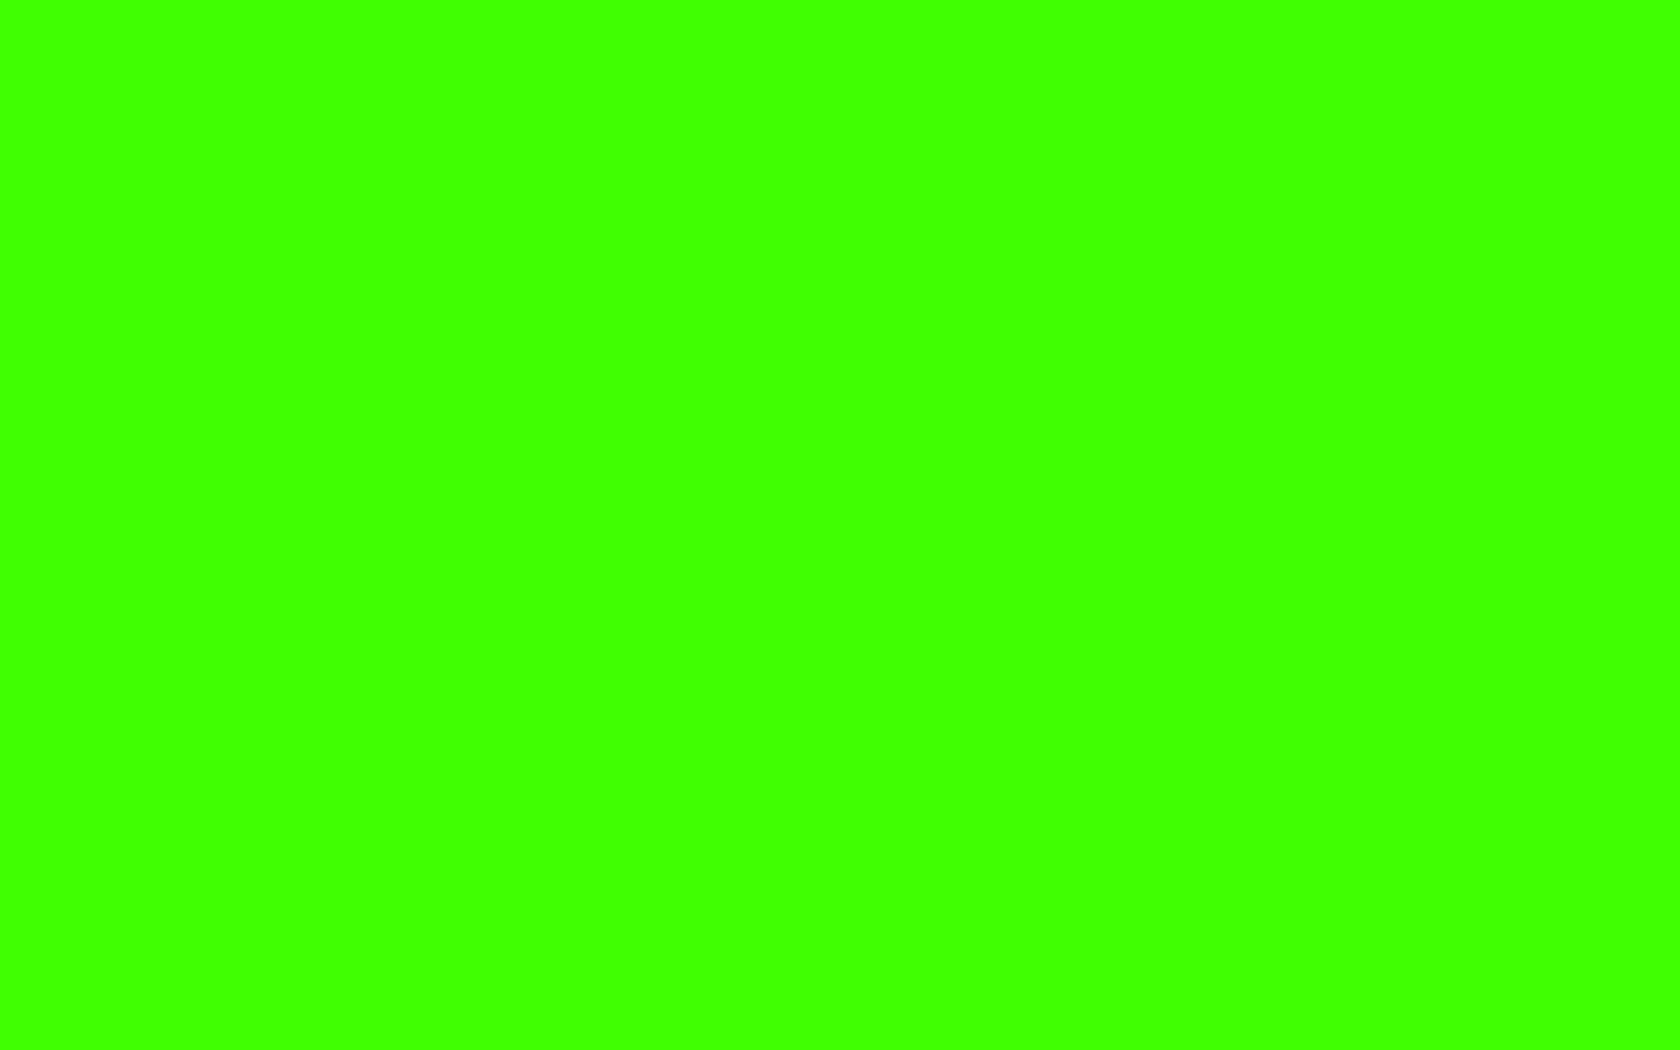 1680x1050 Harlequin Solid Color Background